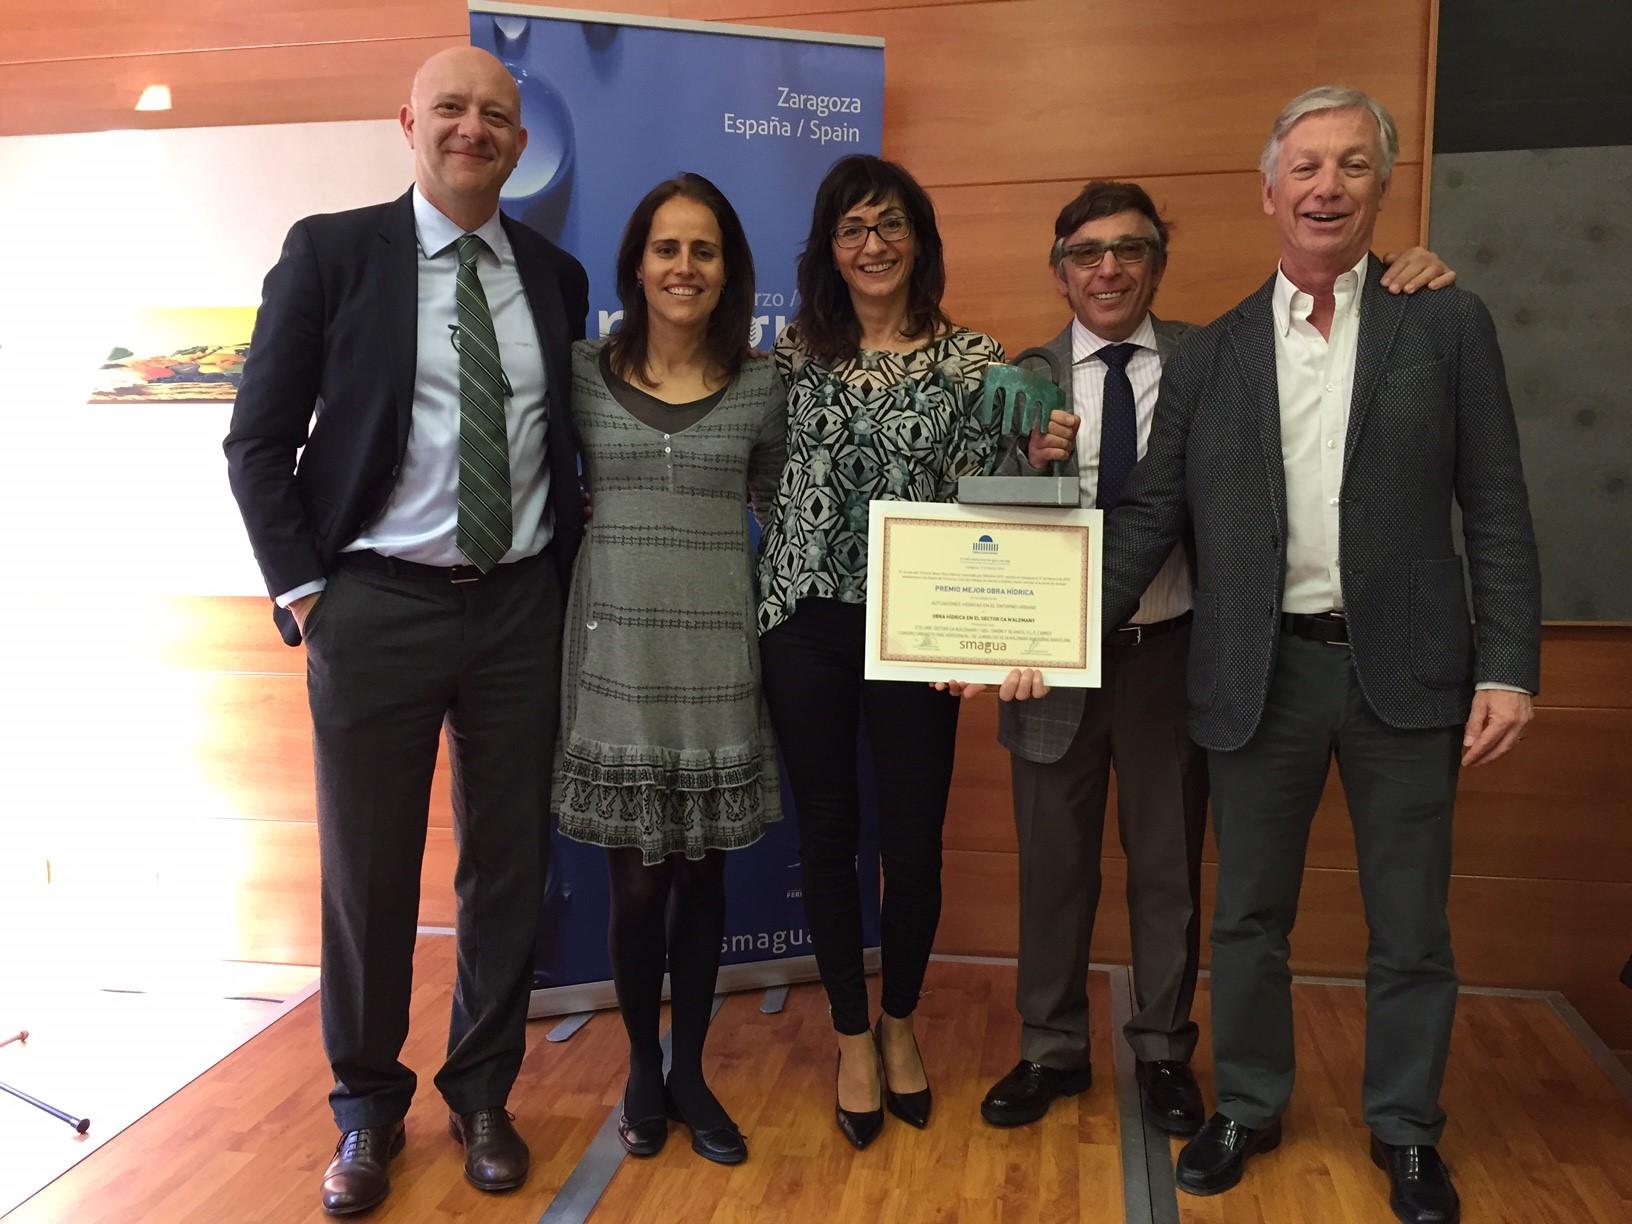 Rubau - Oscar Pardo recoge premio SMAGUA otorgado a Ca N'Alemany